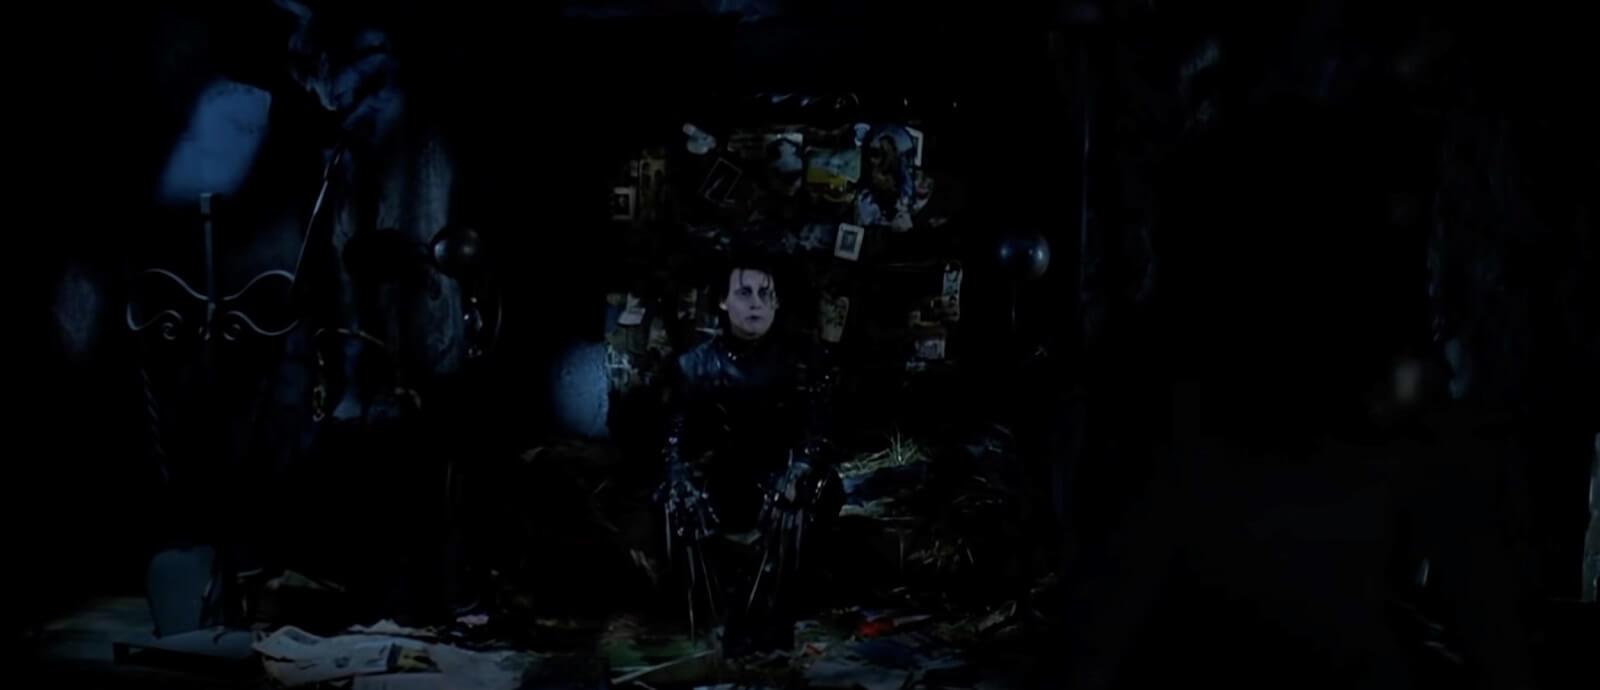 Burtonesque - Theartrical Tim Burton Set Design in Edward Scissorhands